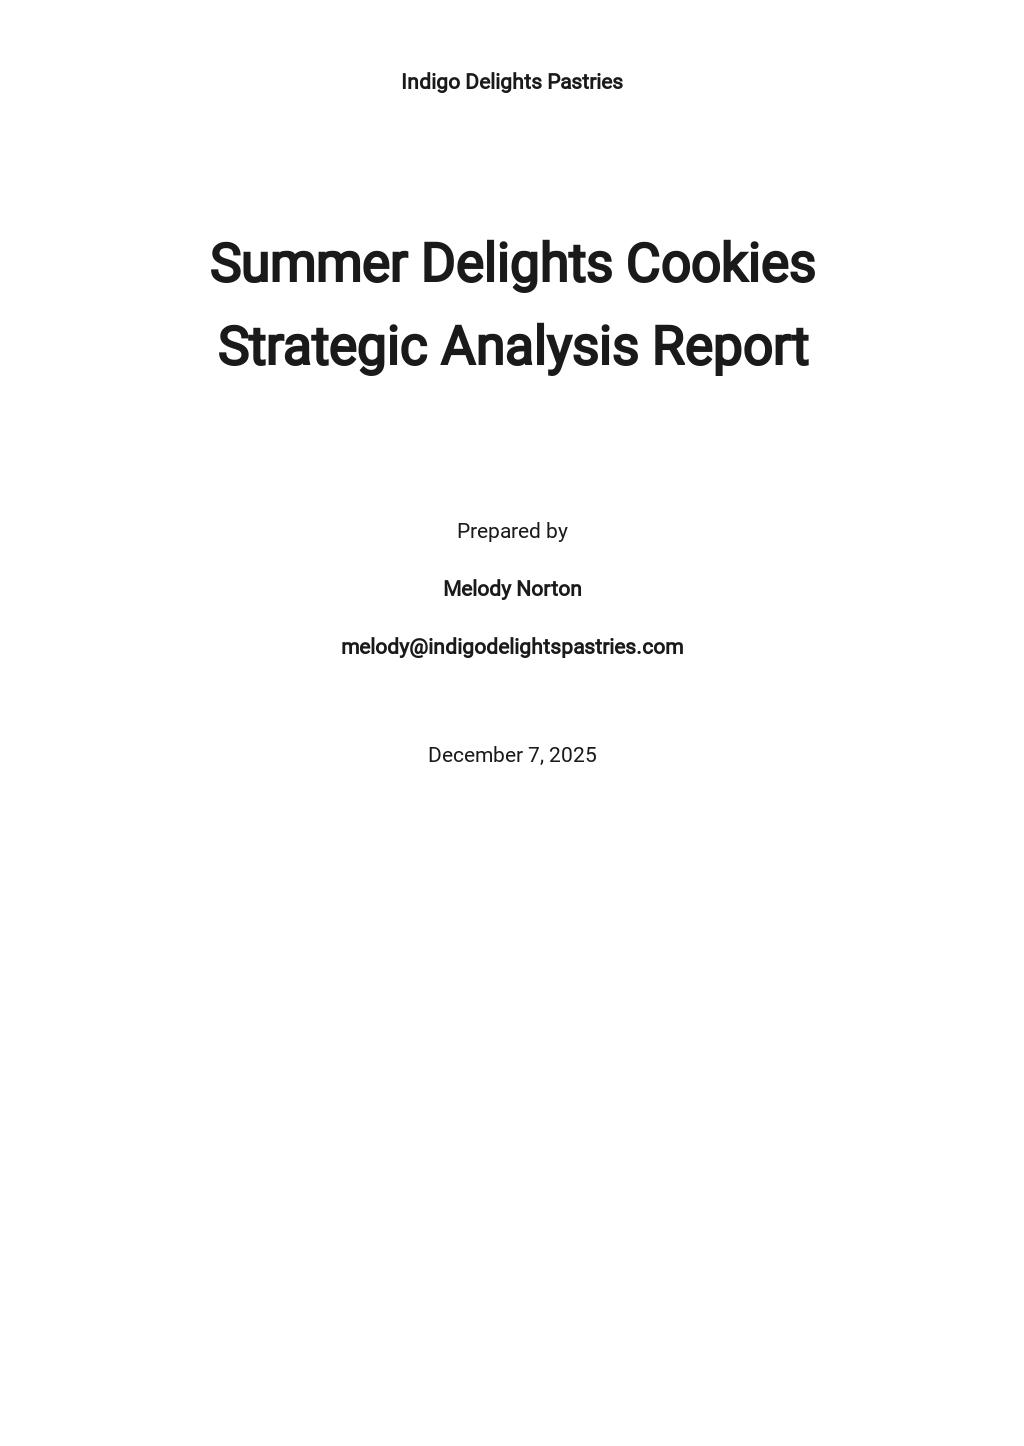 Strategic Analysis Report Template.jpe